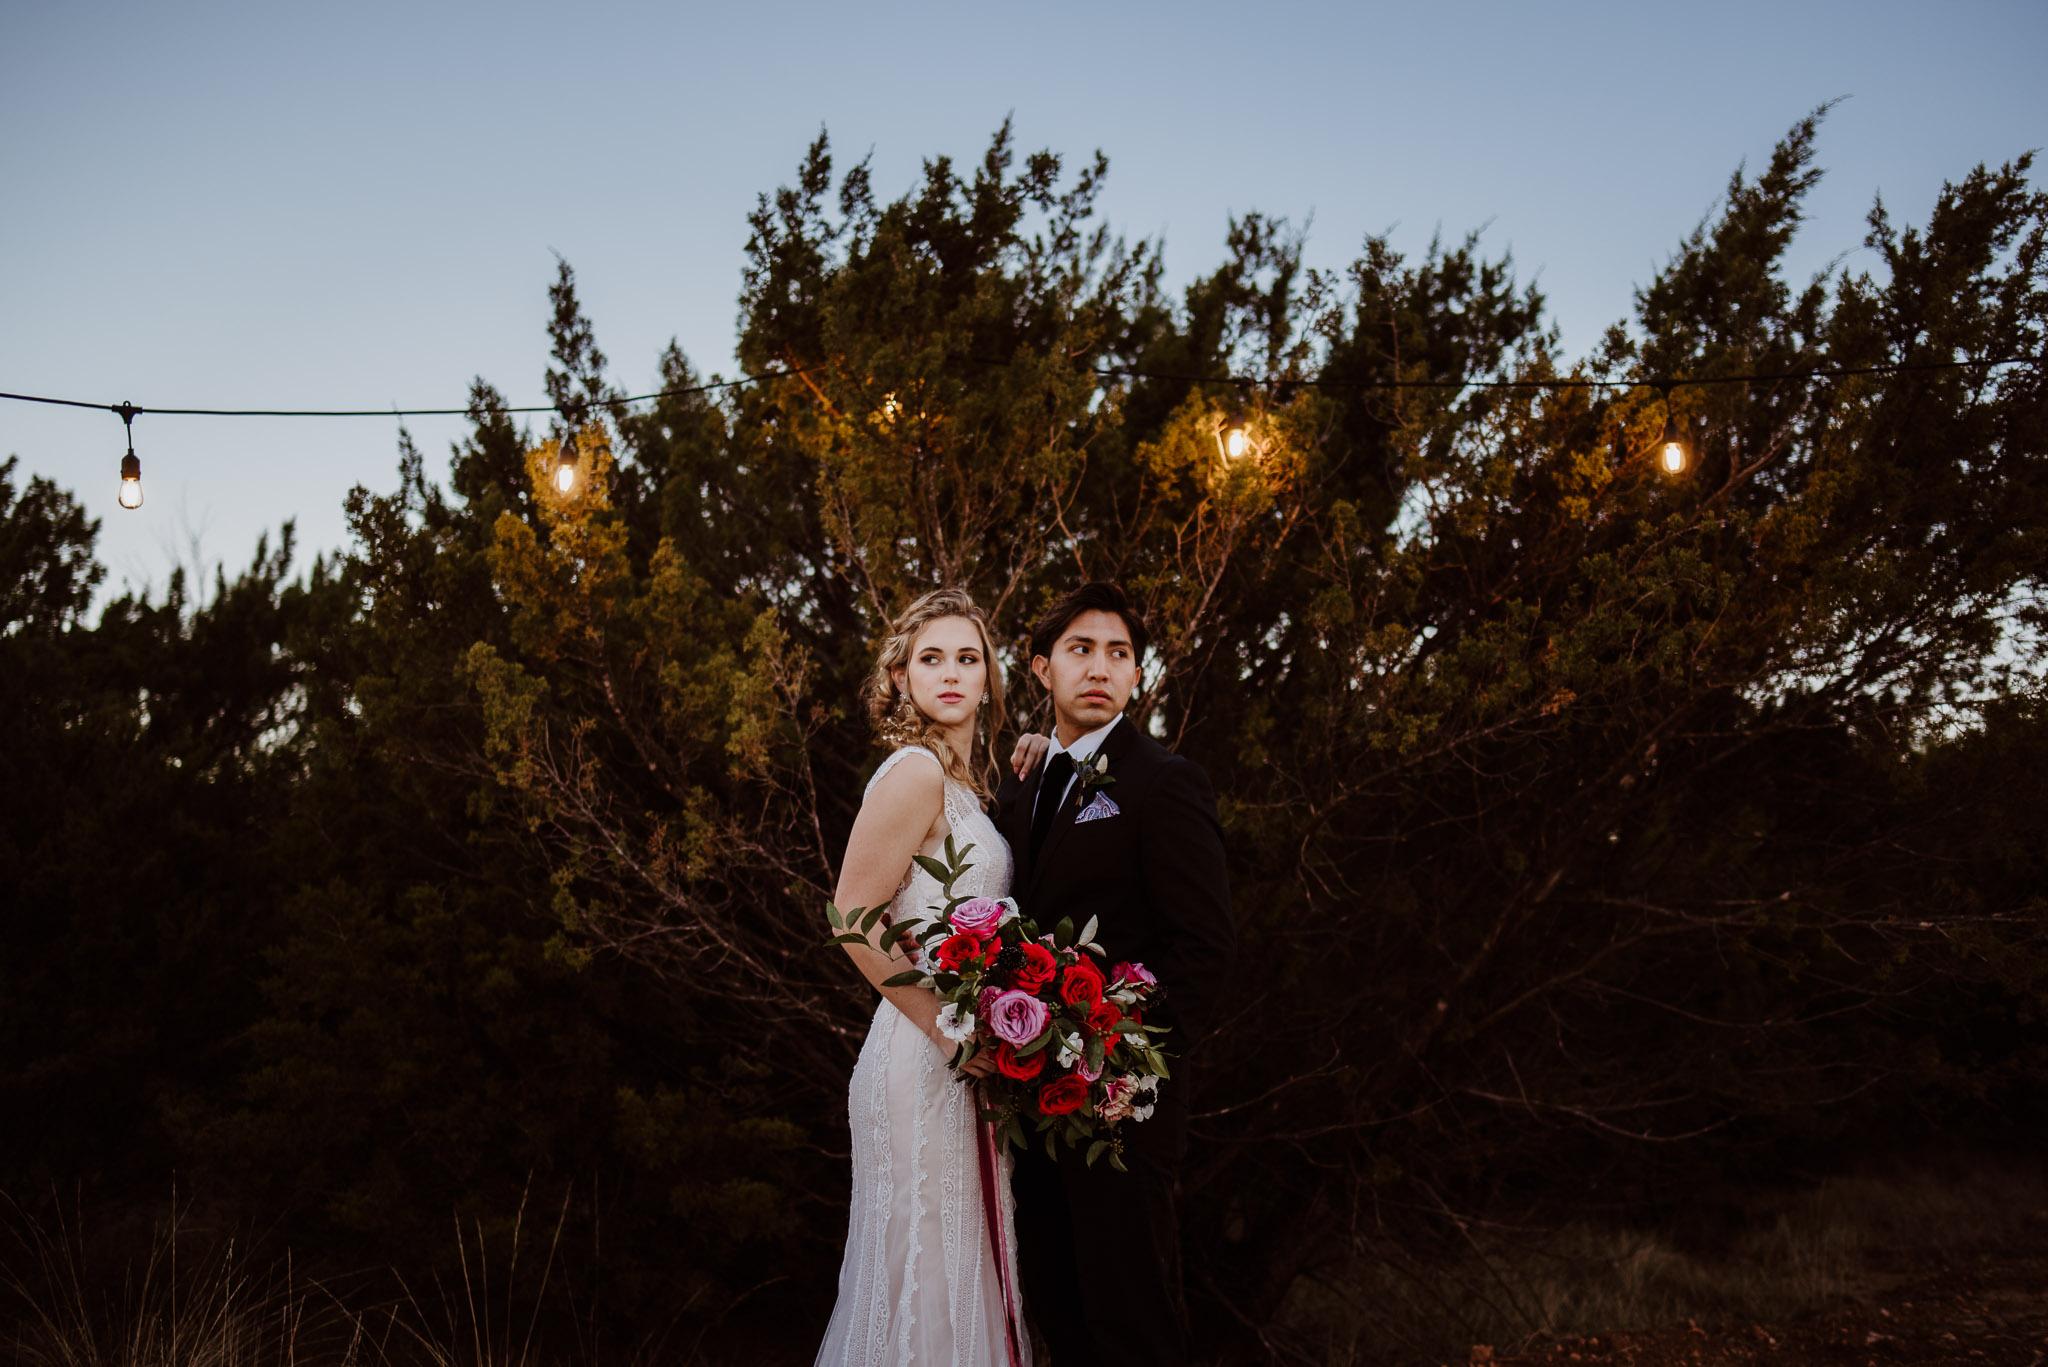 sabrina-cedars-abilene-texas-wedding-venue-0033.jpg